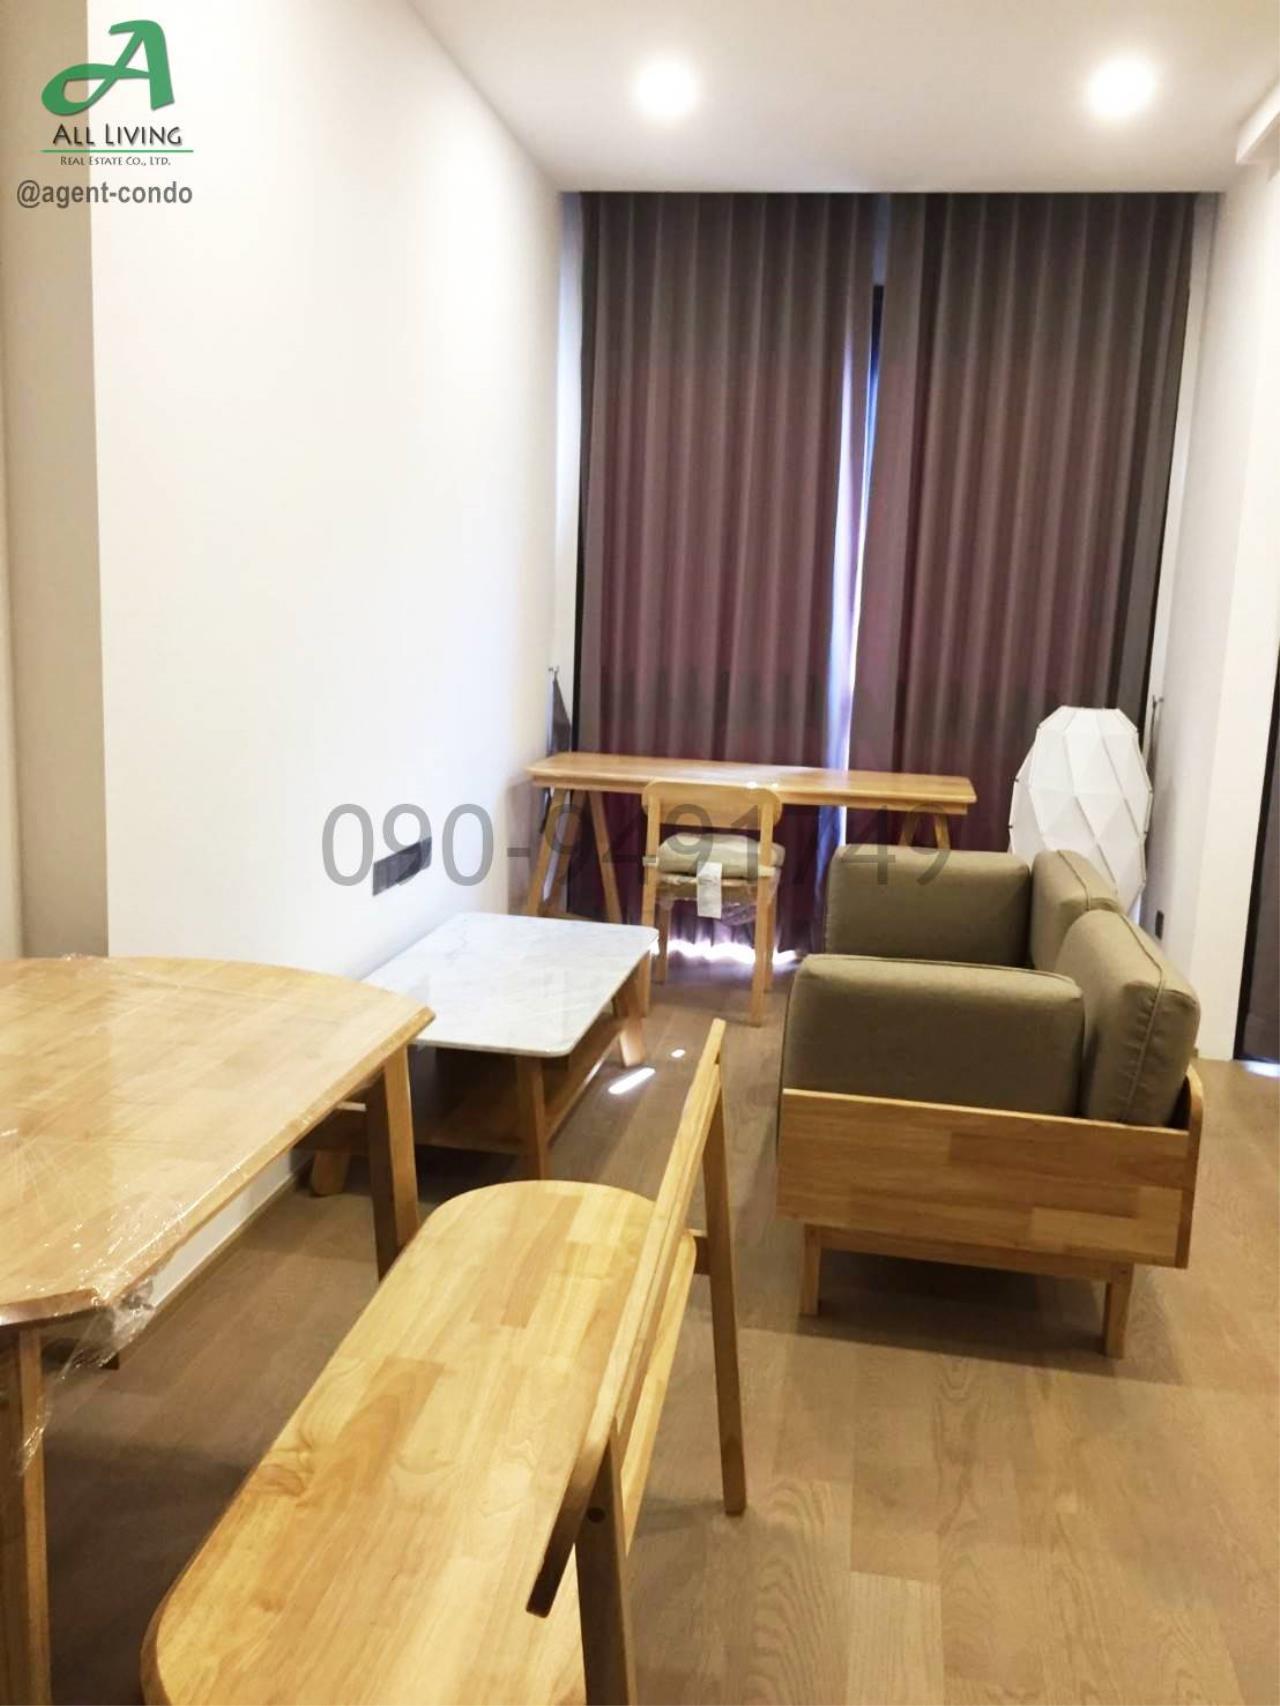 All Living Real Estate Co., Ltd Agency's Ashton Chula-Silom 2